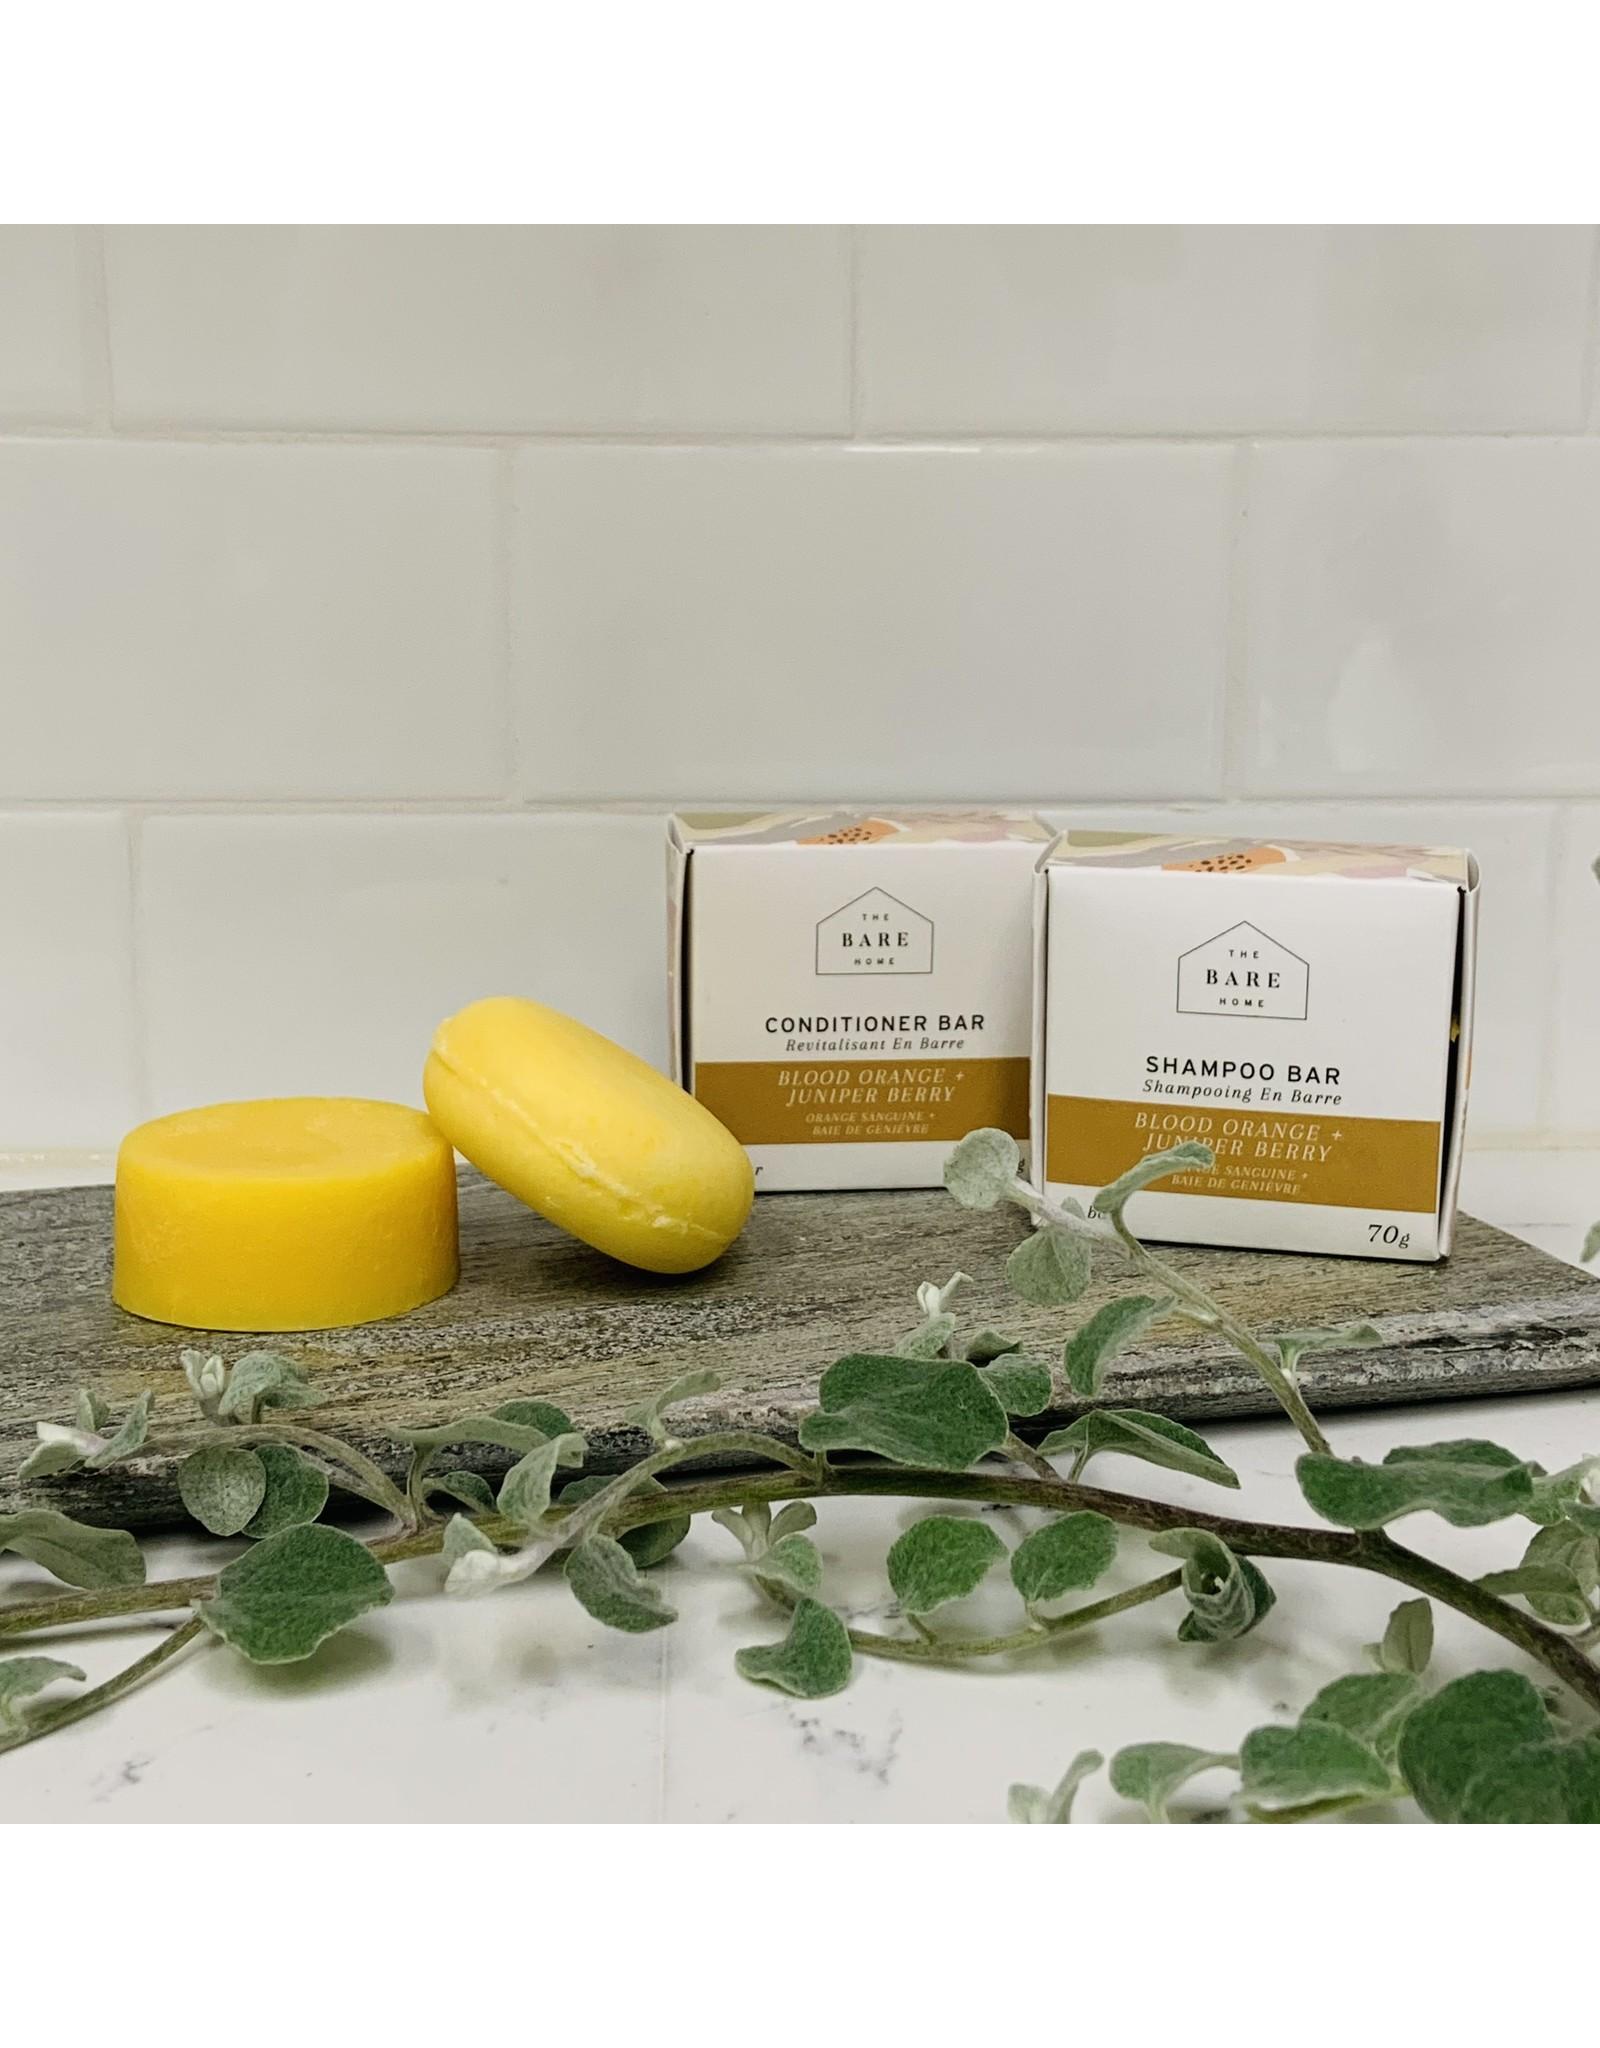 The Bare Home Shampoo Bar by The Bare Home